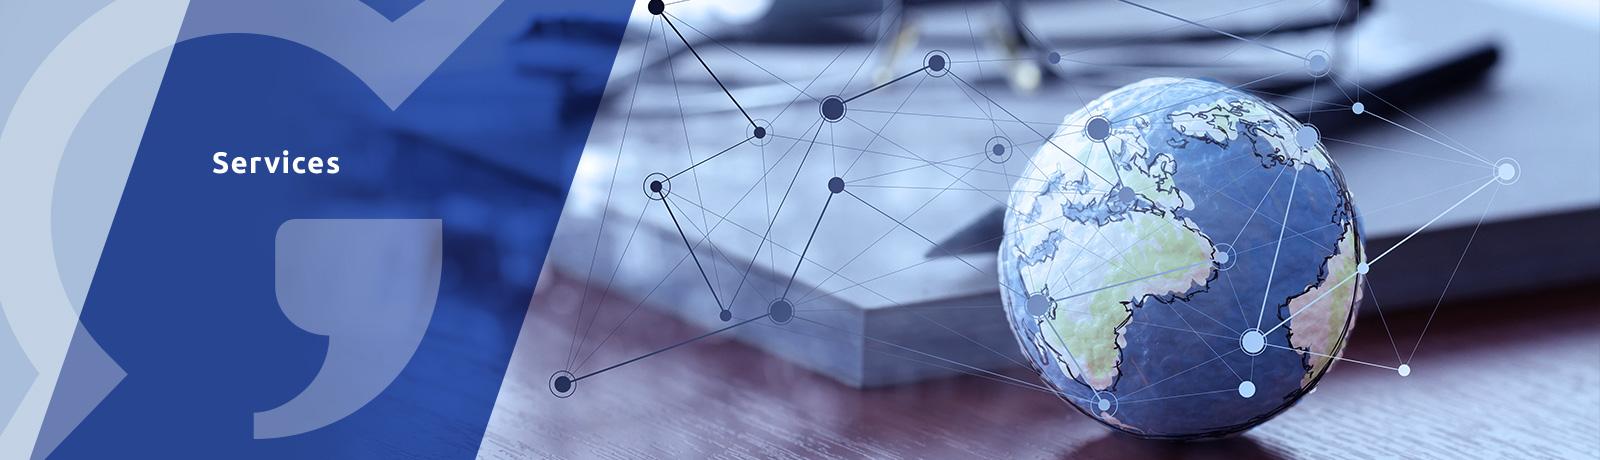 TransGlobe International - Services Porftolio